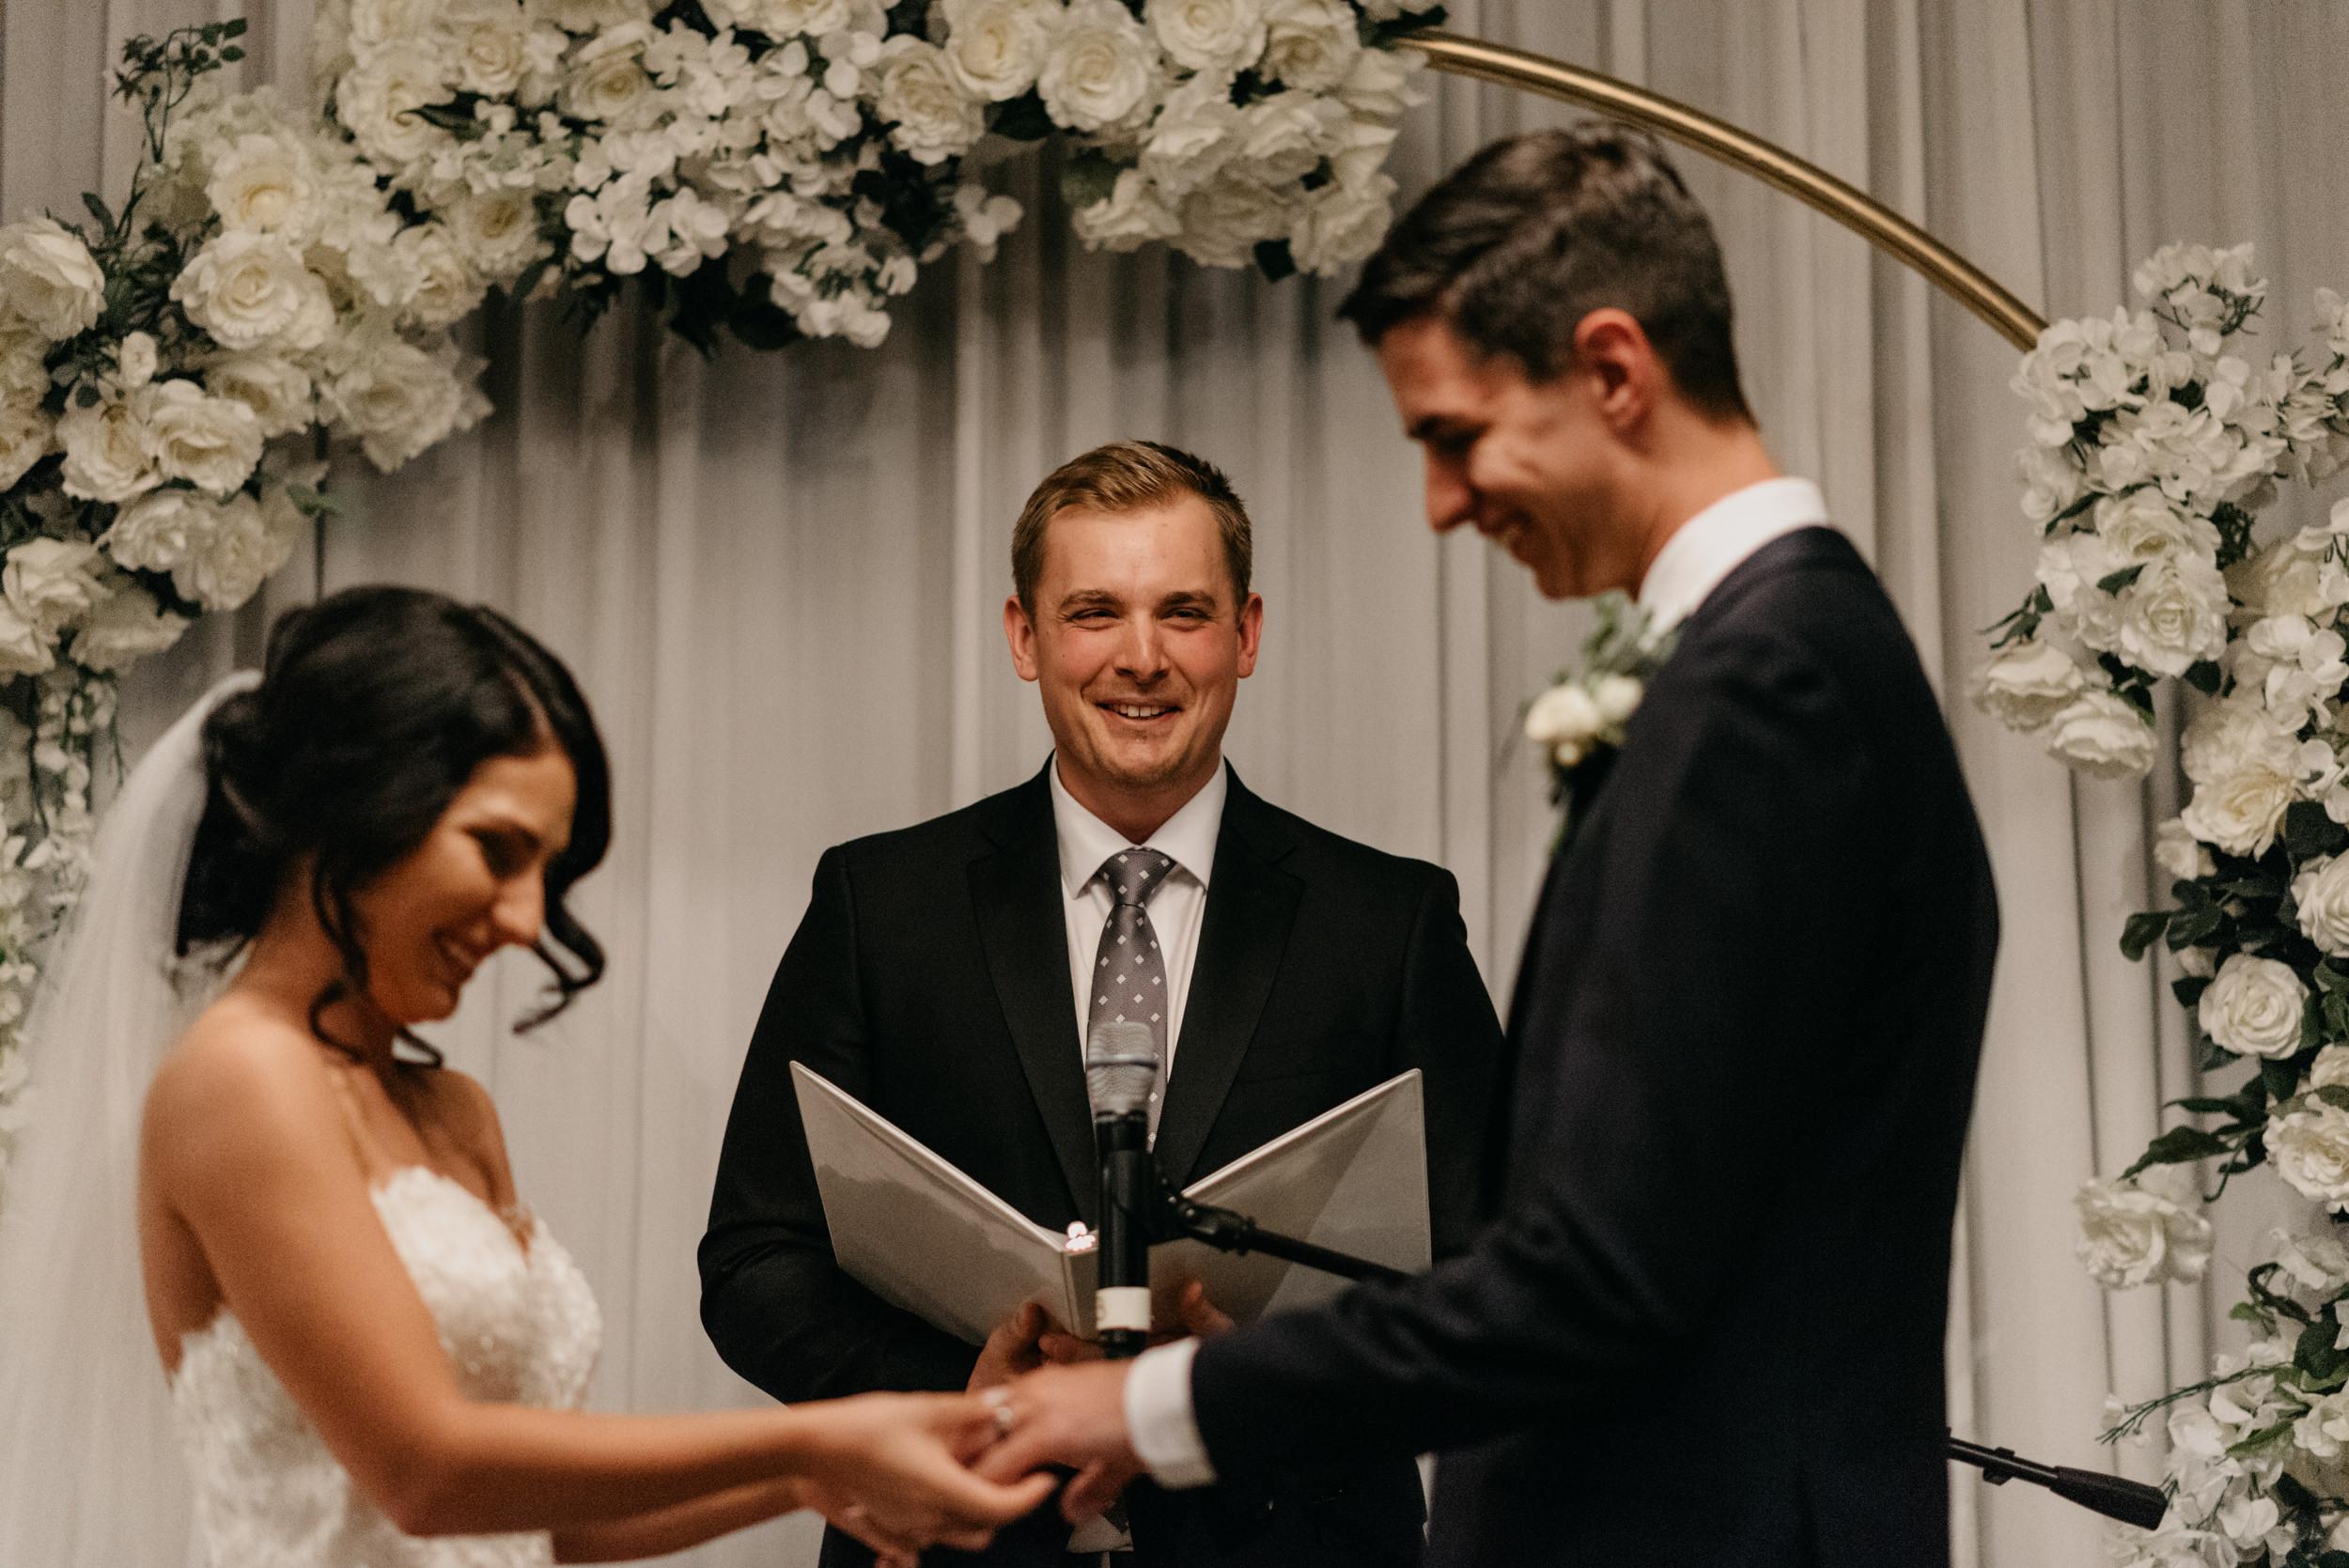 92-ceremony-west-end-ballroom-portland-wedding-venue-9239.jpg